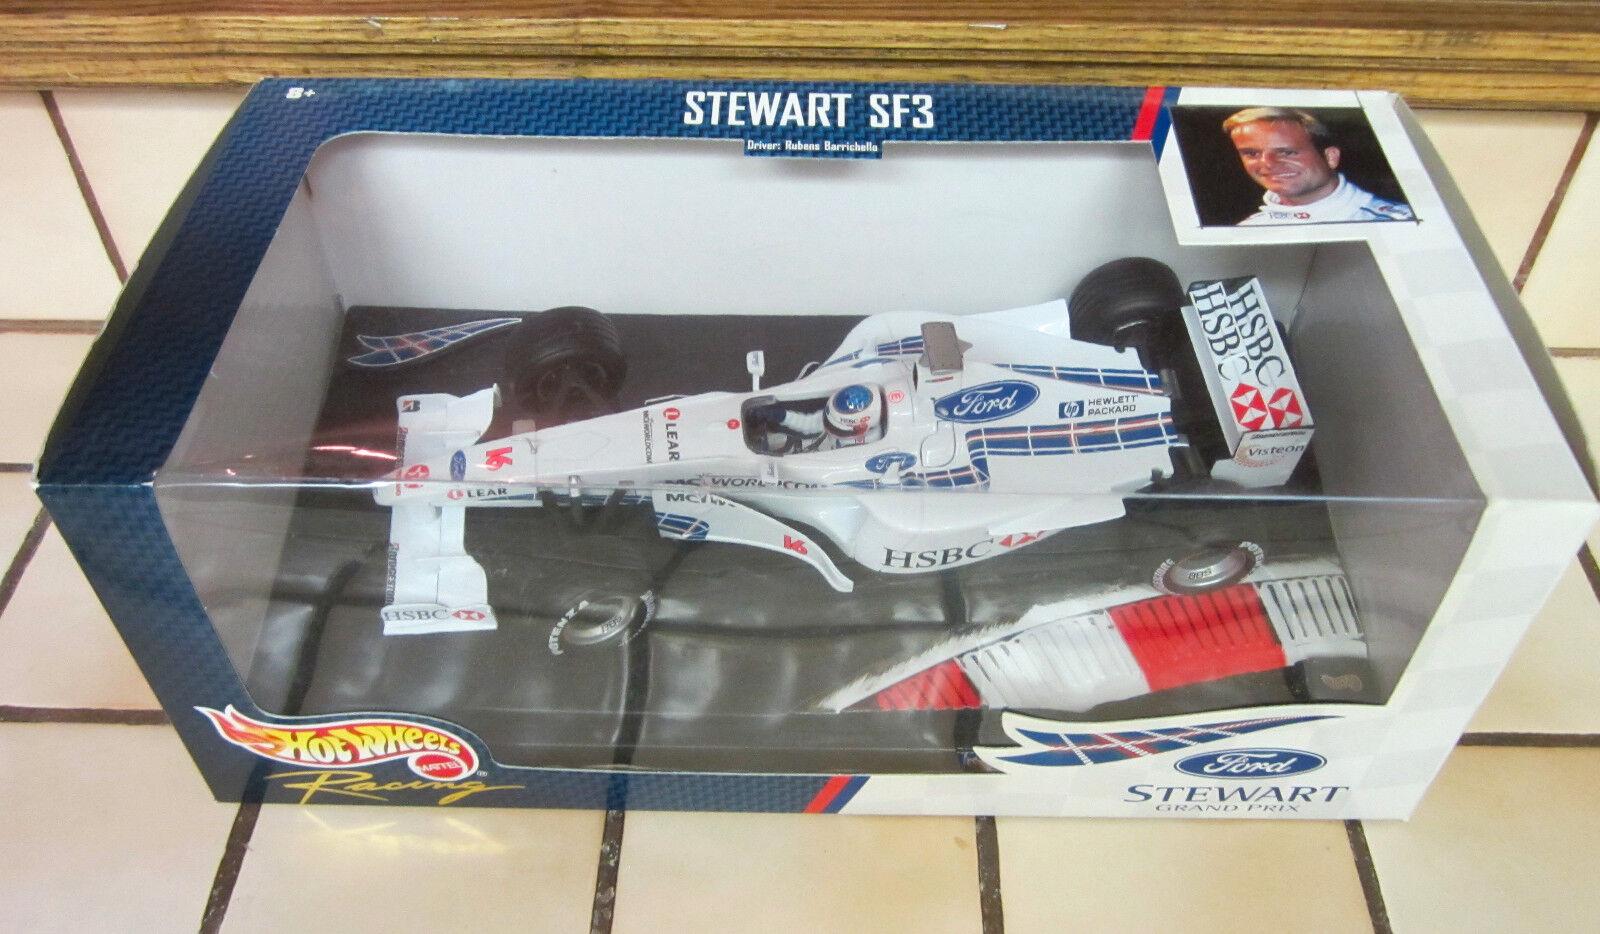 Hot Wheels 1999 STEWART SF3 RUBENS BARRICHELLO 16 Ford Stewart Grand Prix 1:18